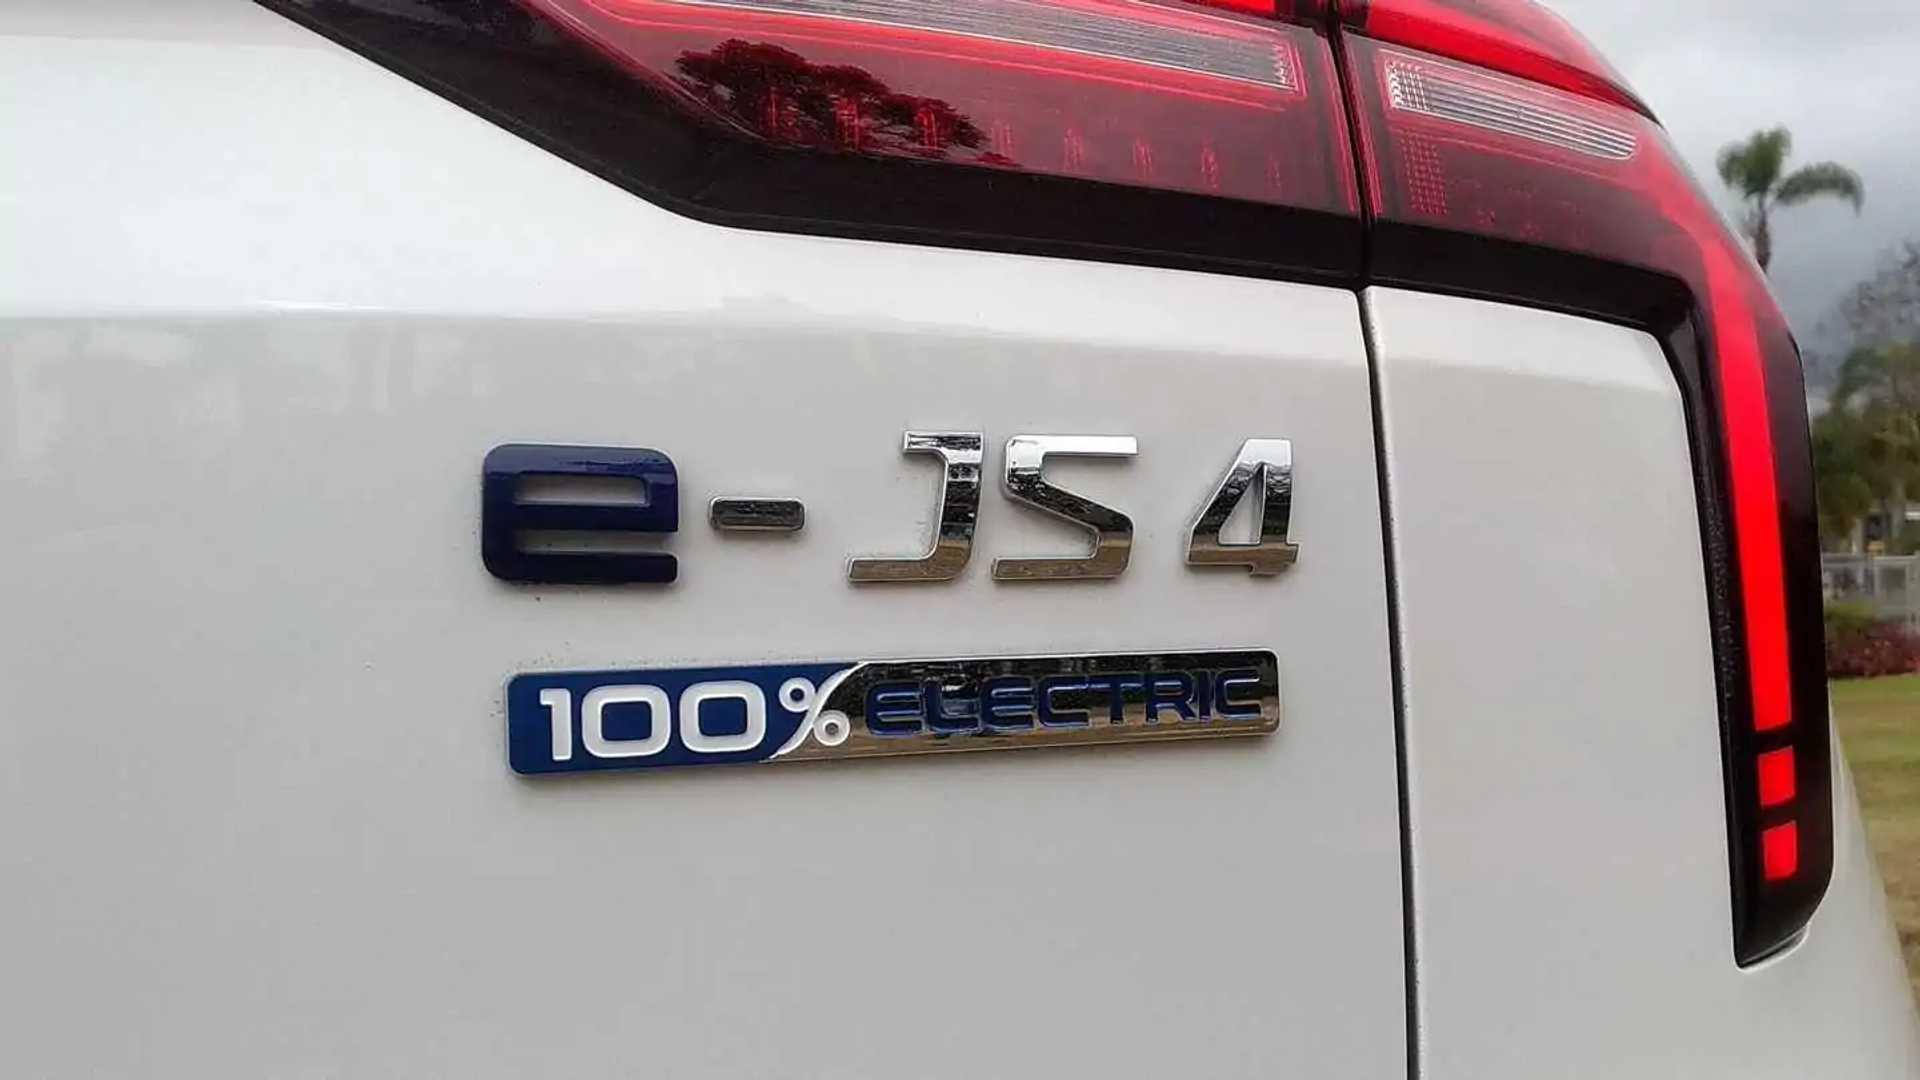 https://cdn.motor1.com/images/mgl/pKz4r/s6/jac-e-js4---test-drive-5-logo.jpg